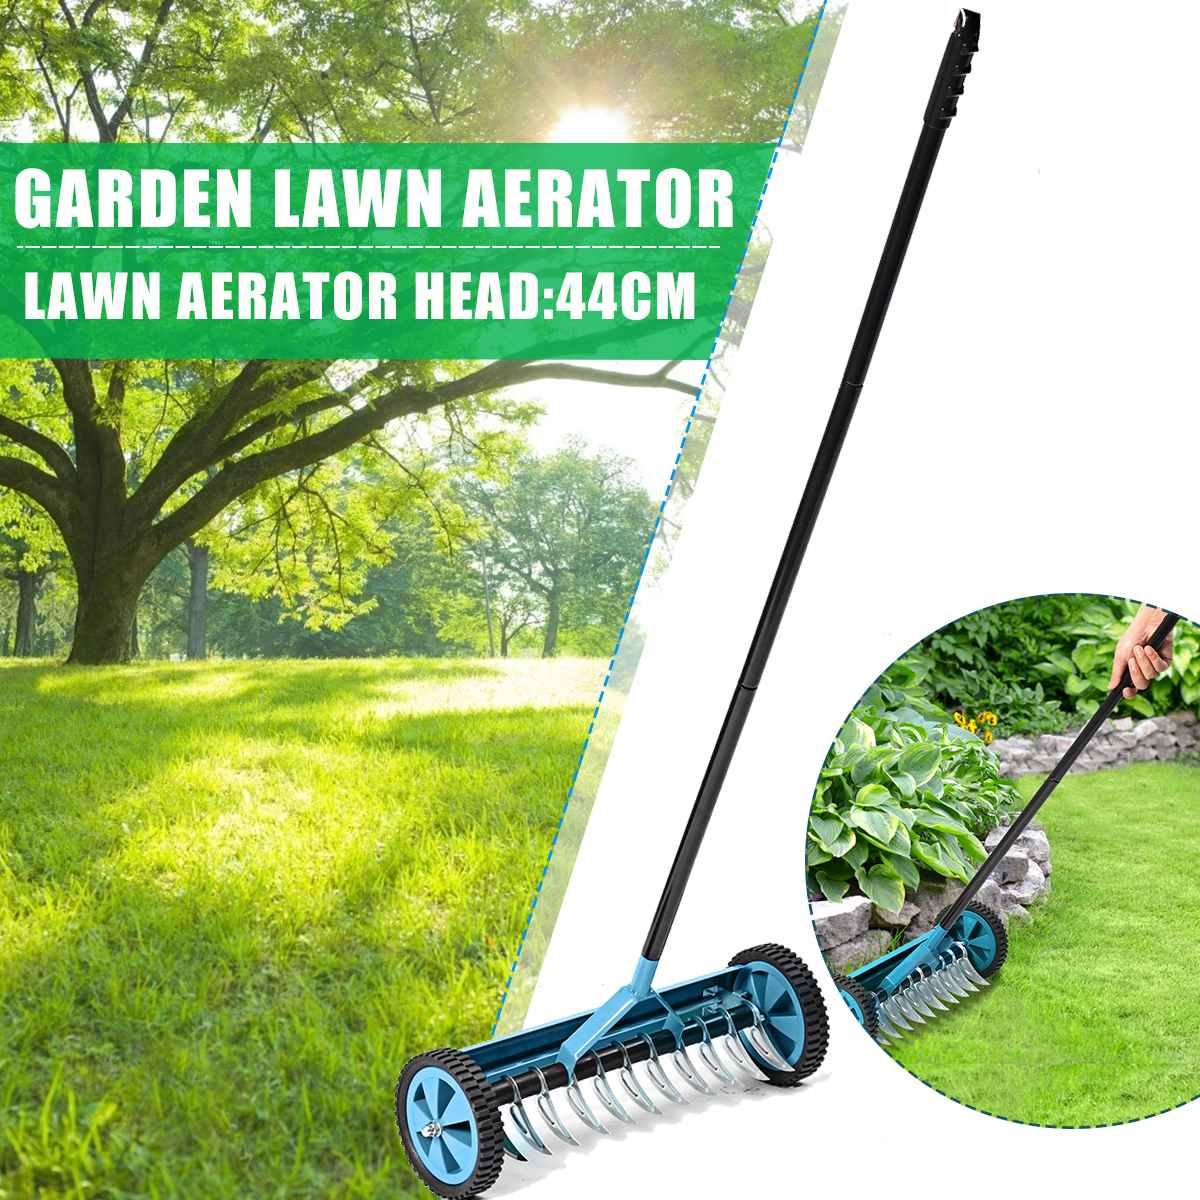 5.7 inch Heavy Duty Rolling Grass Lawn Garden Aerator Roller Yard Grass Cultivator Scarification Push Spike Aerator Rolling Lawn